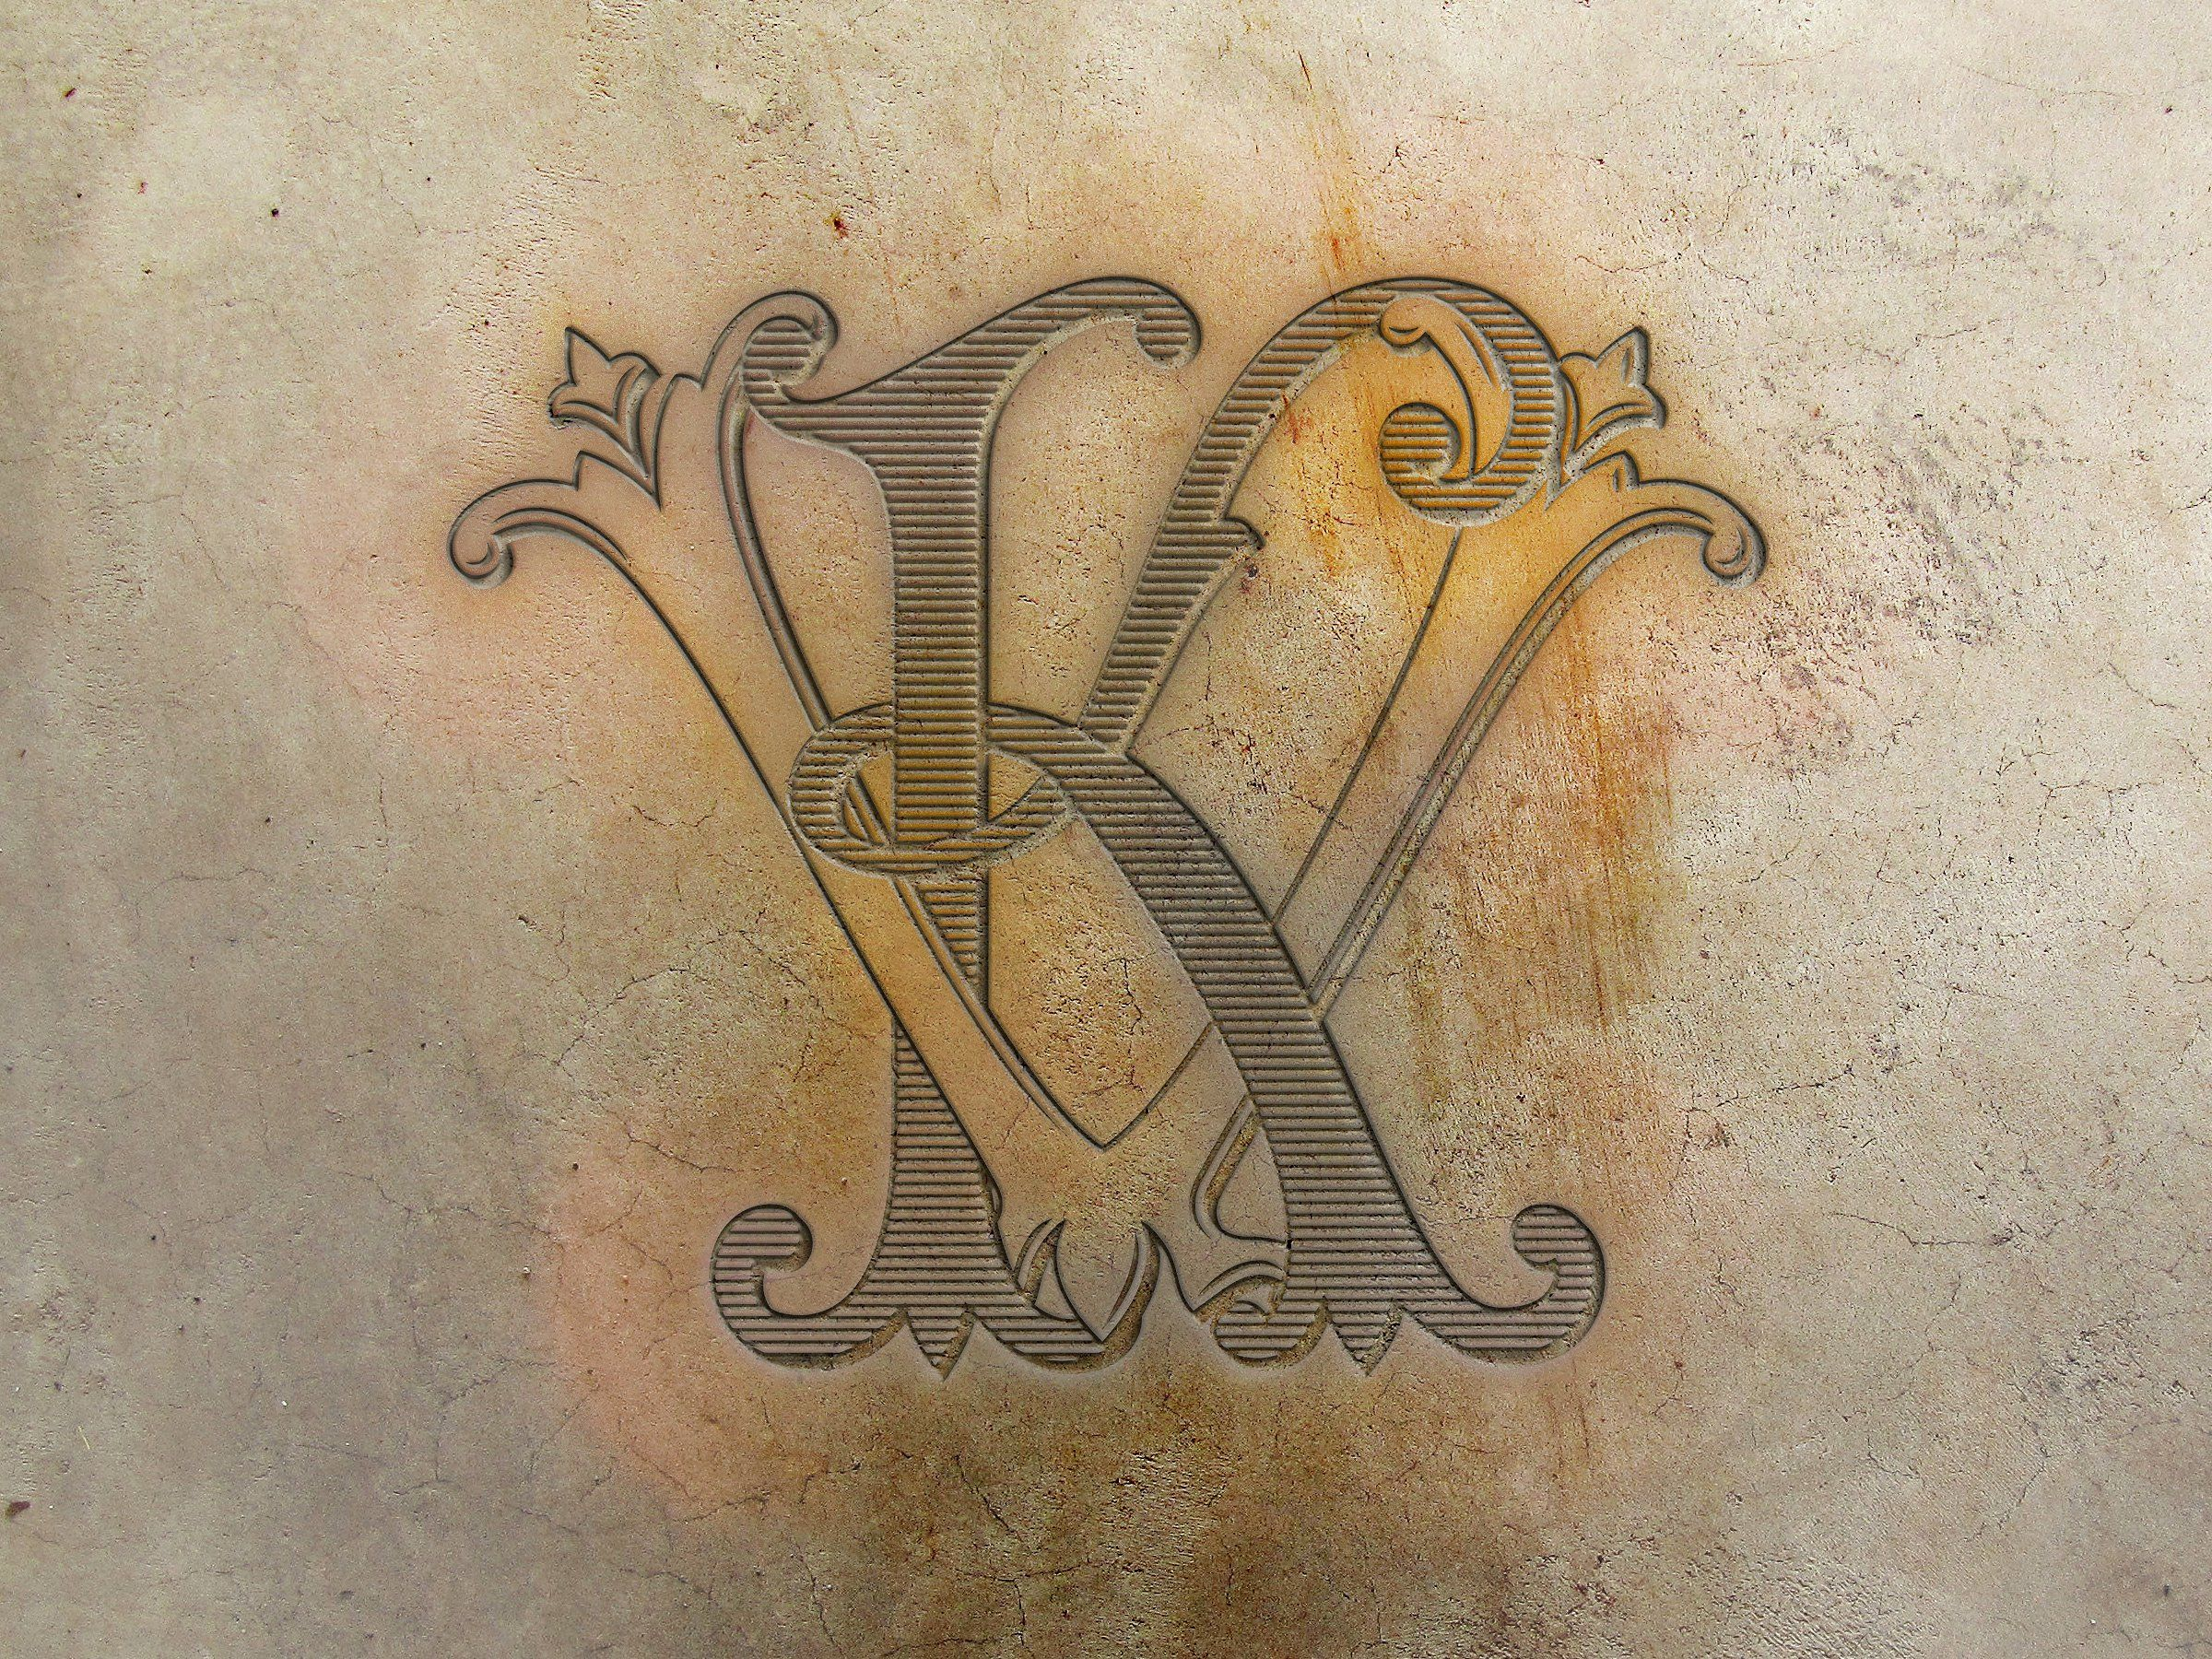 Kv Monogram Vk Monogram Name Tattoo Designs Monogram Tattoo Lettering